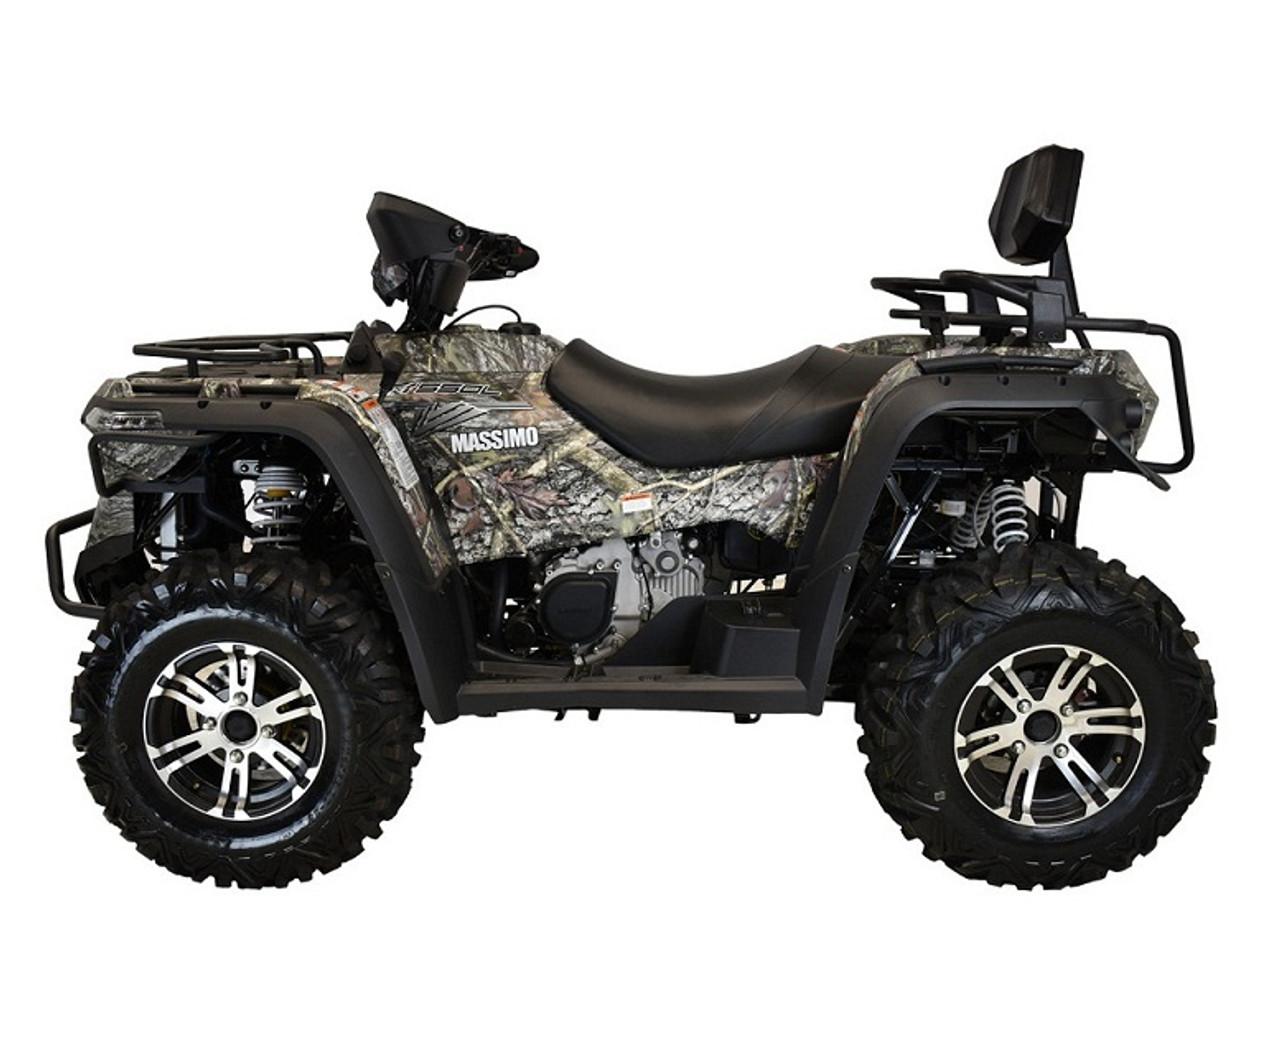 MASSIMO MSA 550 ATV, 493CC FOUR-STROKE, SINGLE CYLINDER SOHC